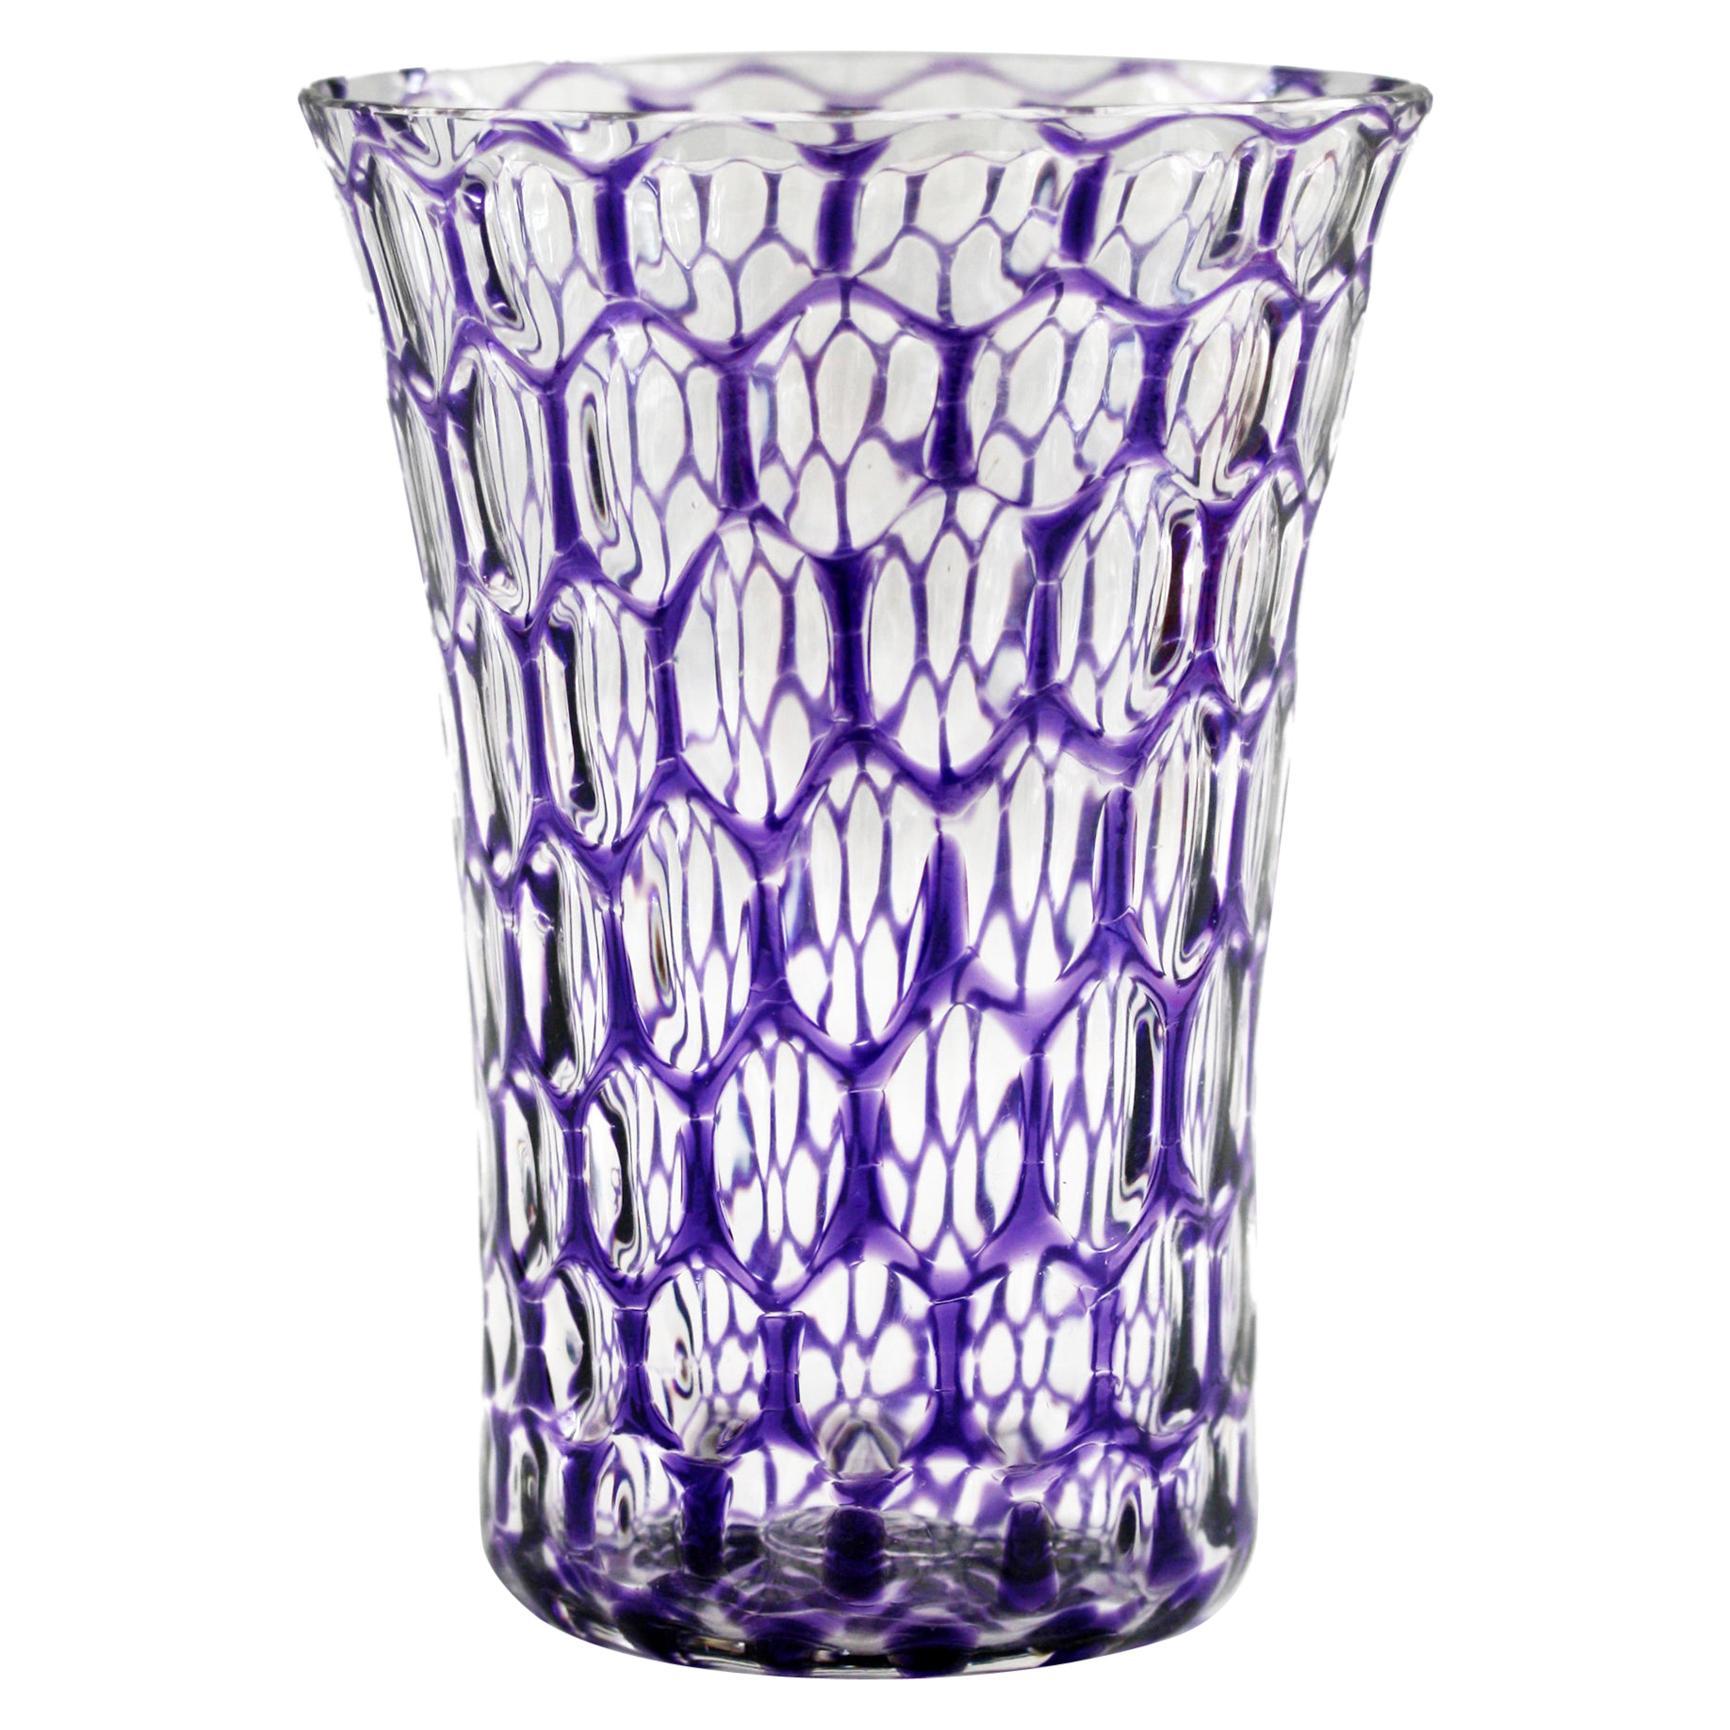 Stevens & Williams Attributed Bucket Shape Purple Flashed Optical Glass Vase